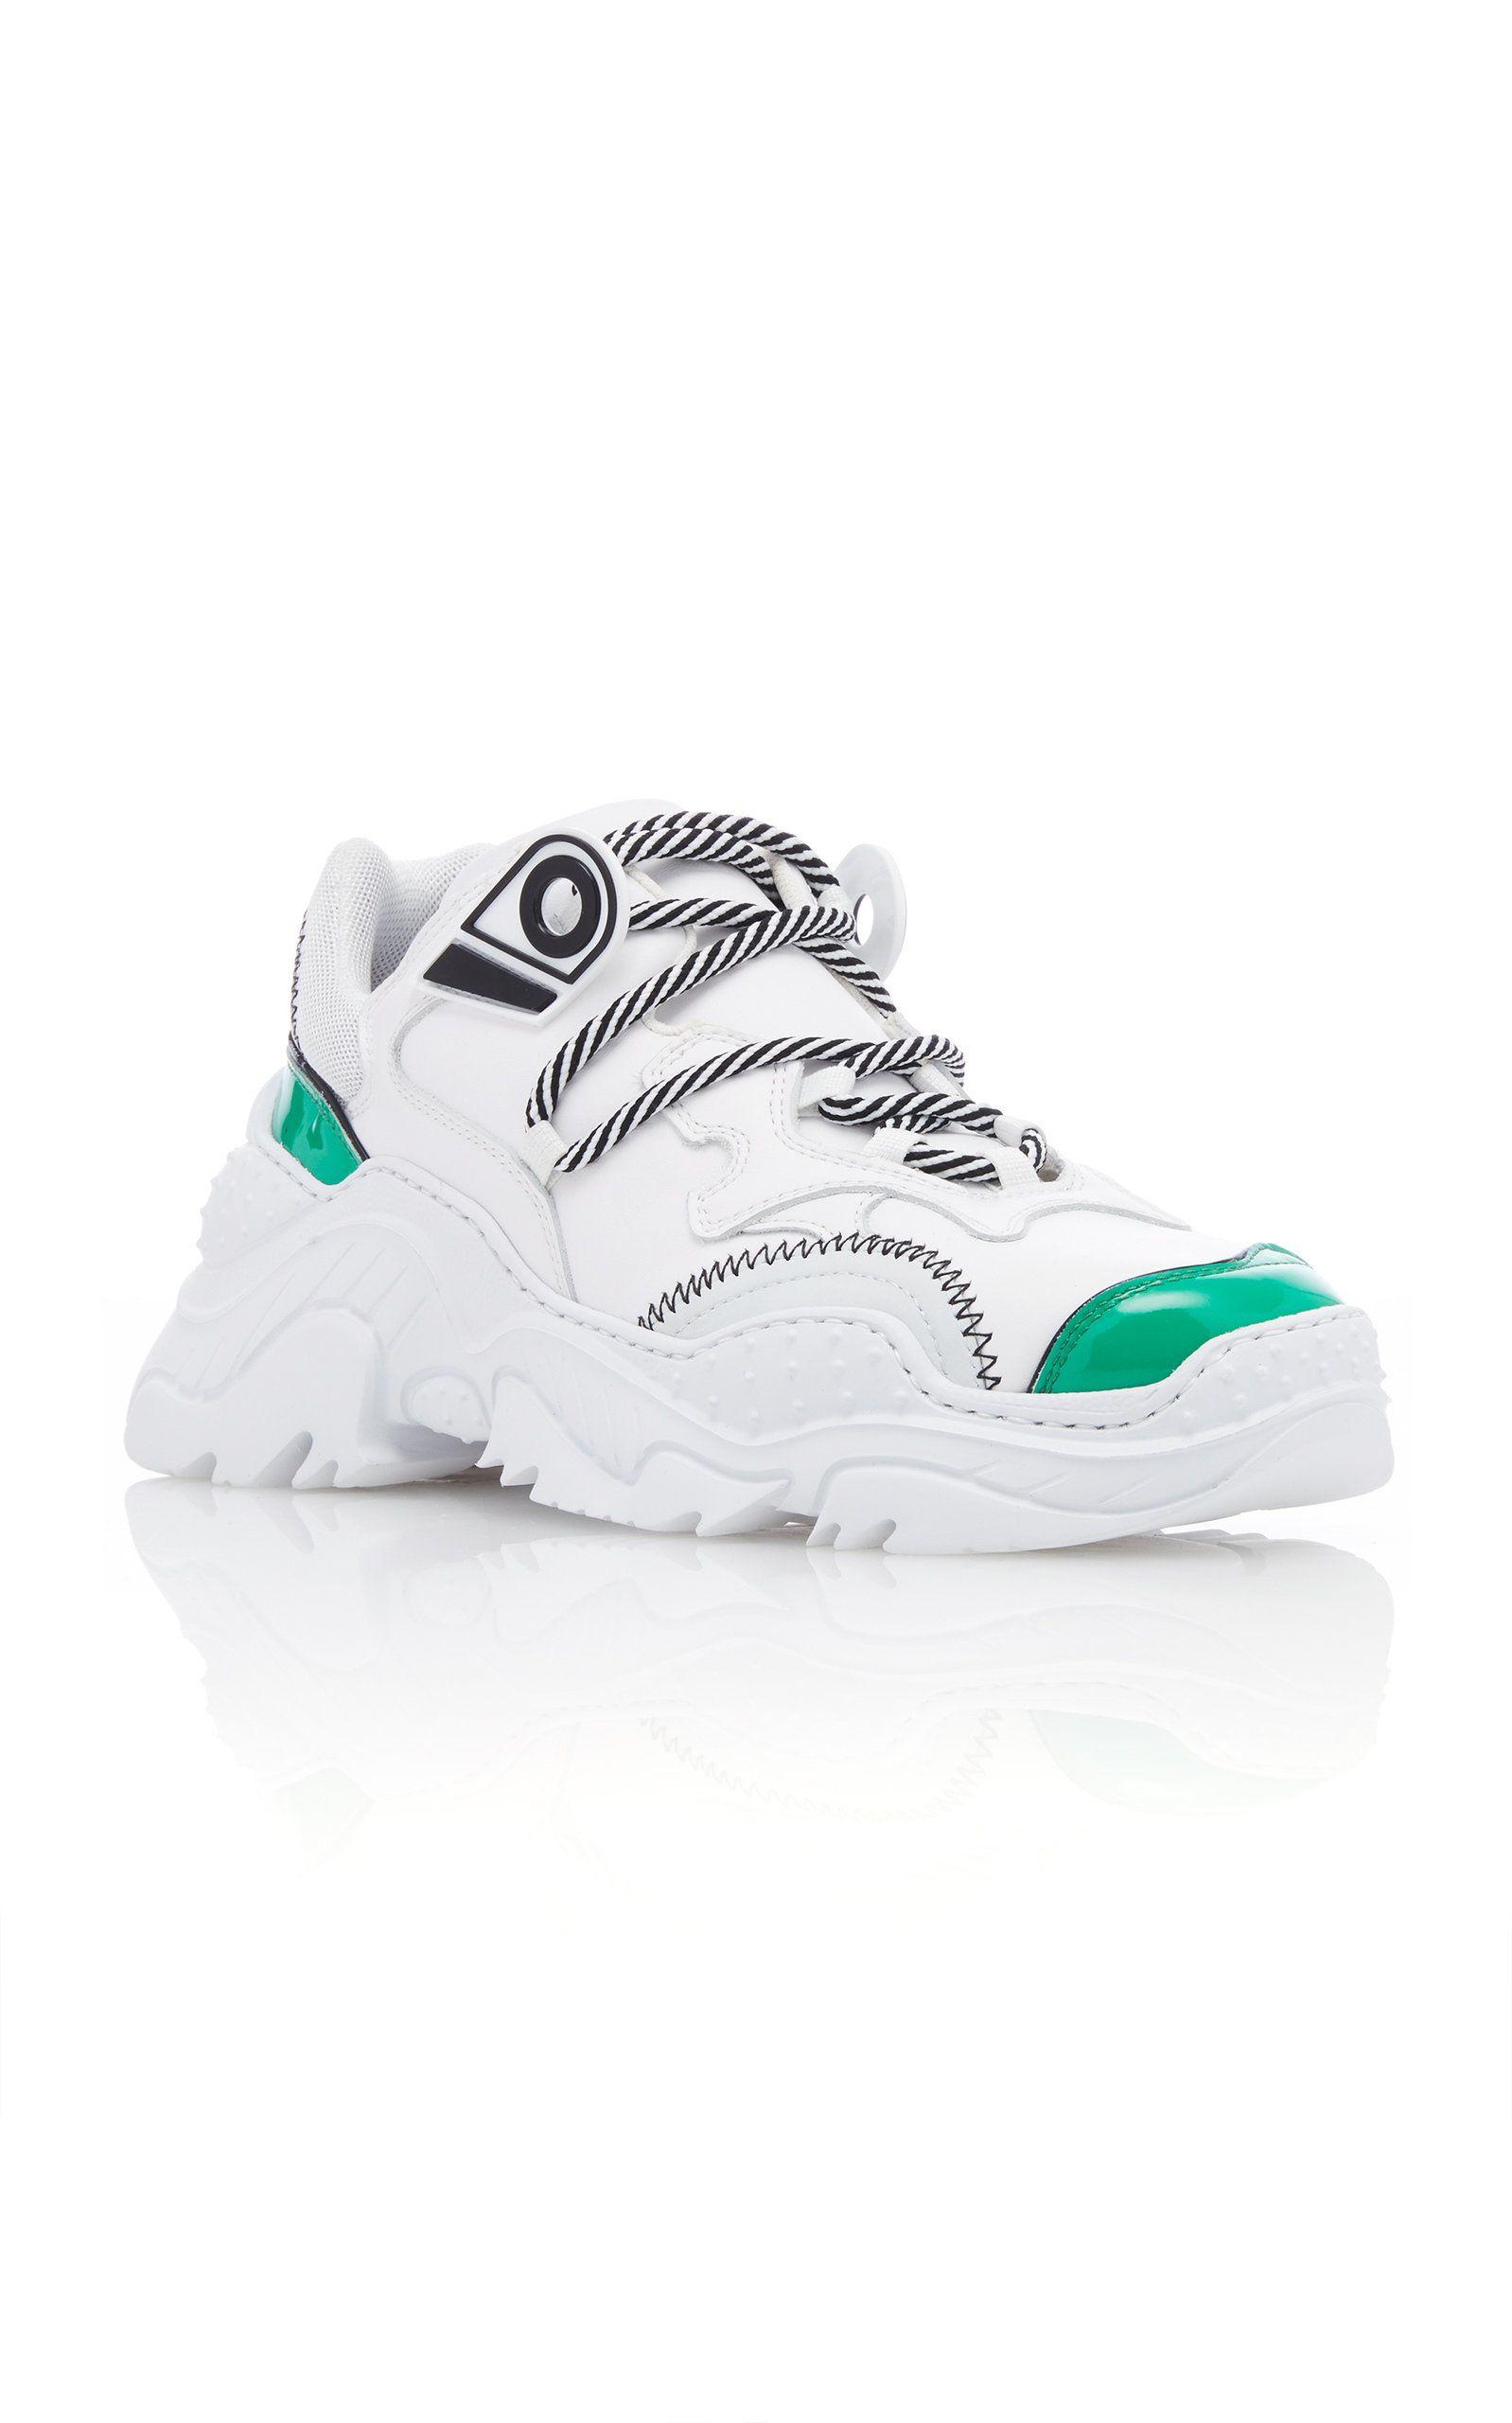 new arrivals 7dce4 8411b N°21 Billy Sneaker